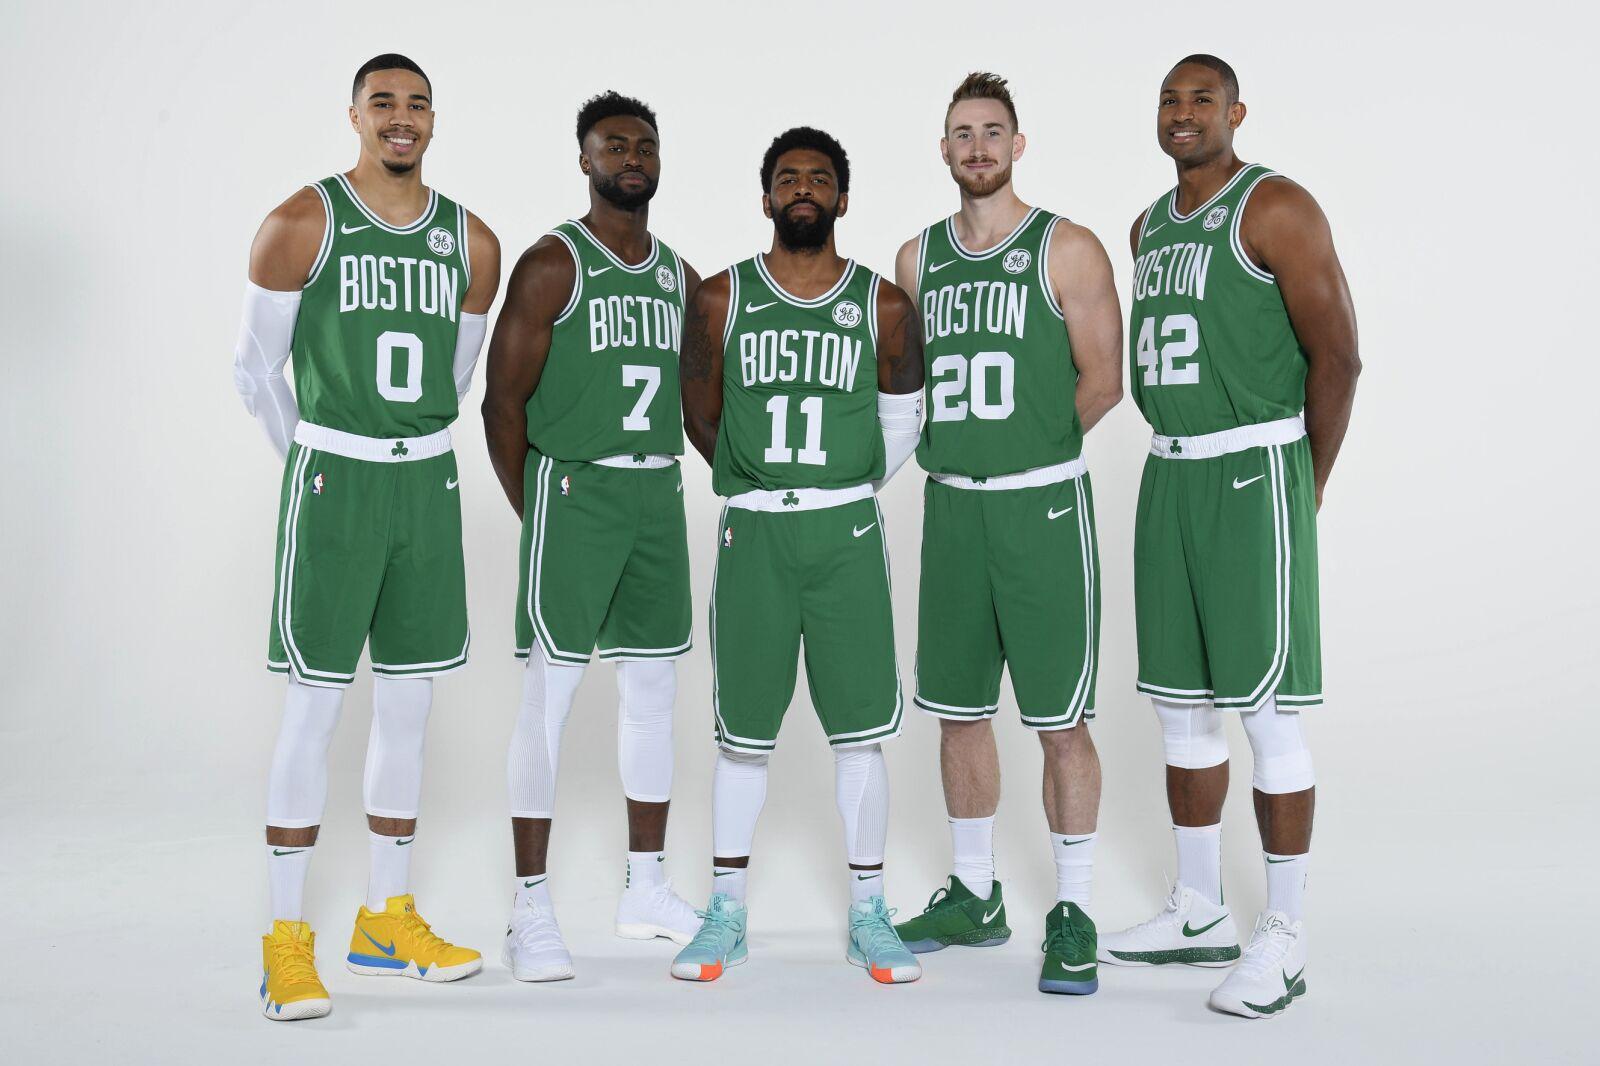 Boston Celtics Official 2018 19 Nba Season Preview Page 5